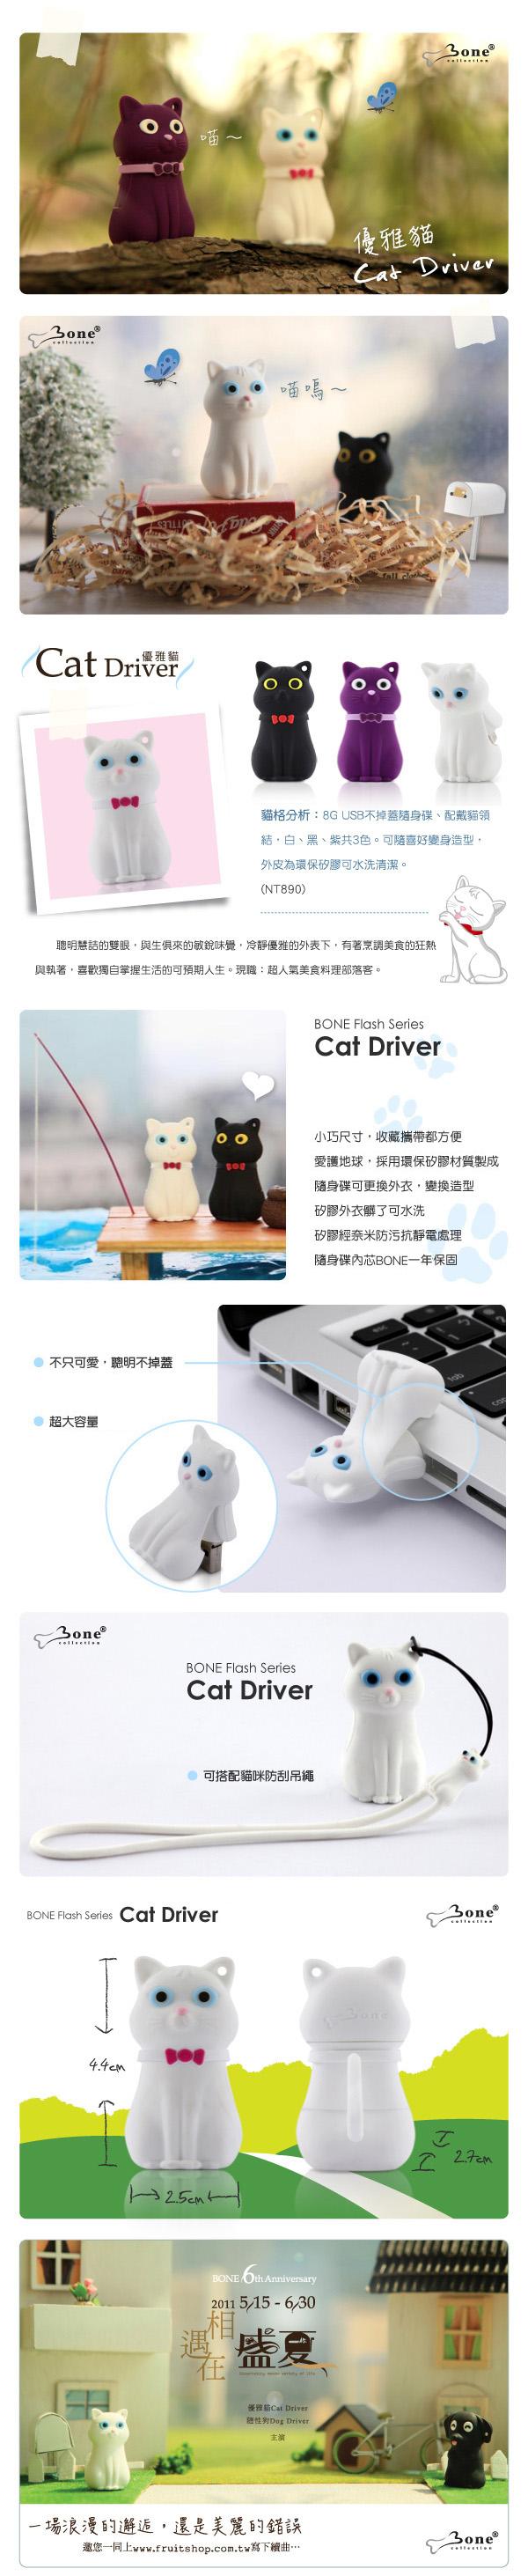 Bone|Cat Driver 優雅貓隨身碟-紫(16G)